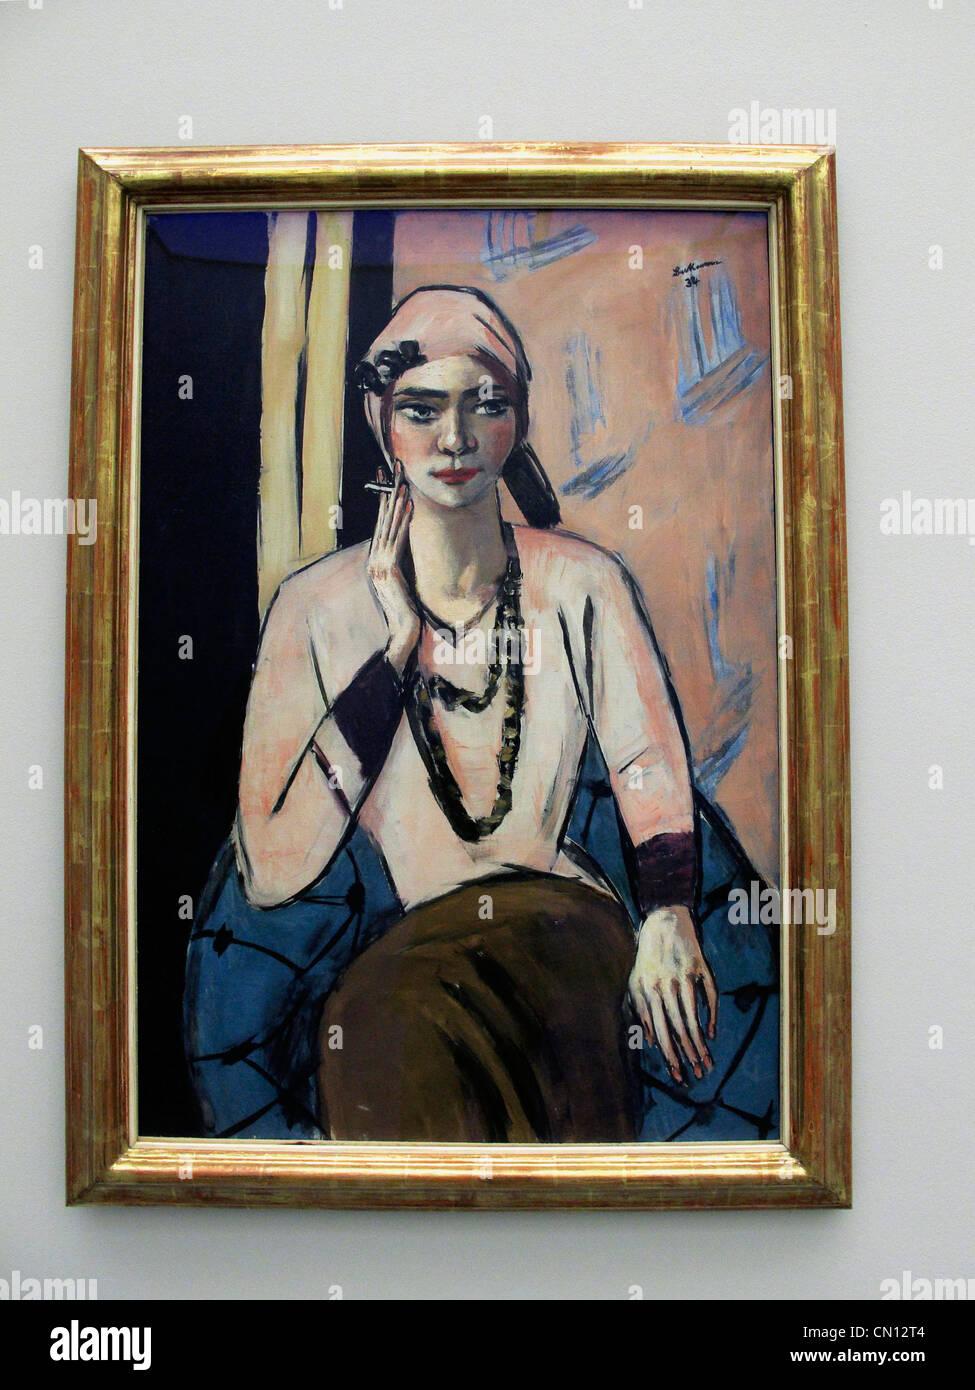 Fabelhaft Moderne Pullover Ideen Von Max Beckmann 1932 Qusuperbi Rosa Frauen Ausstellung